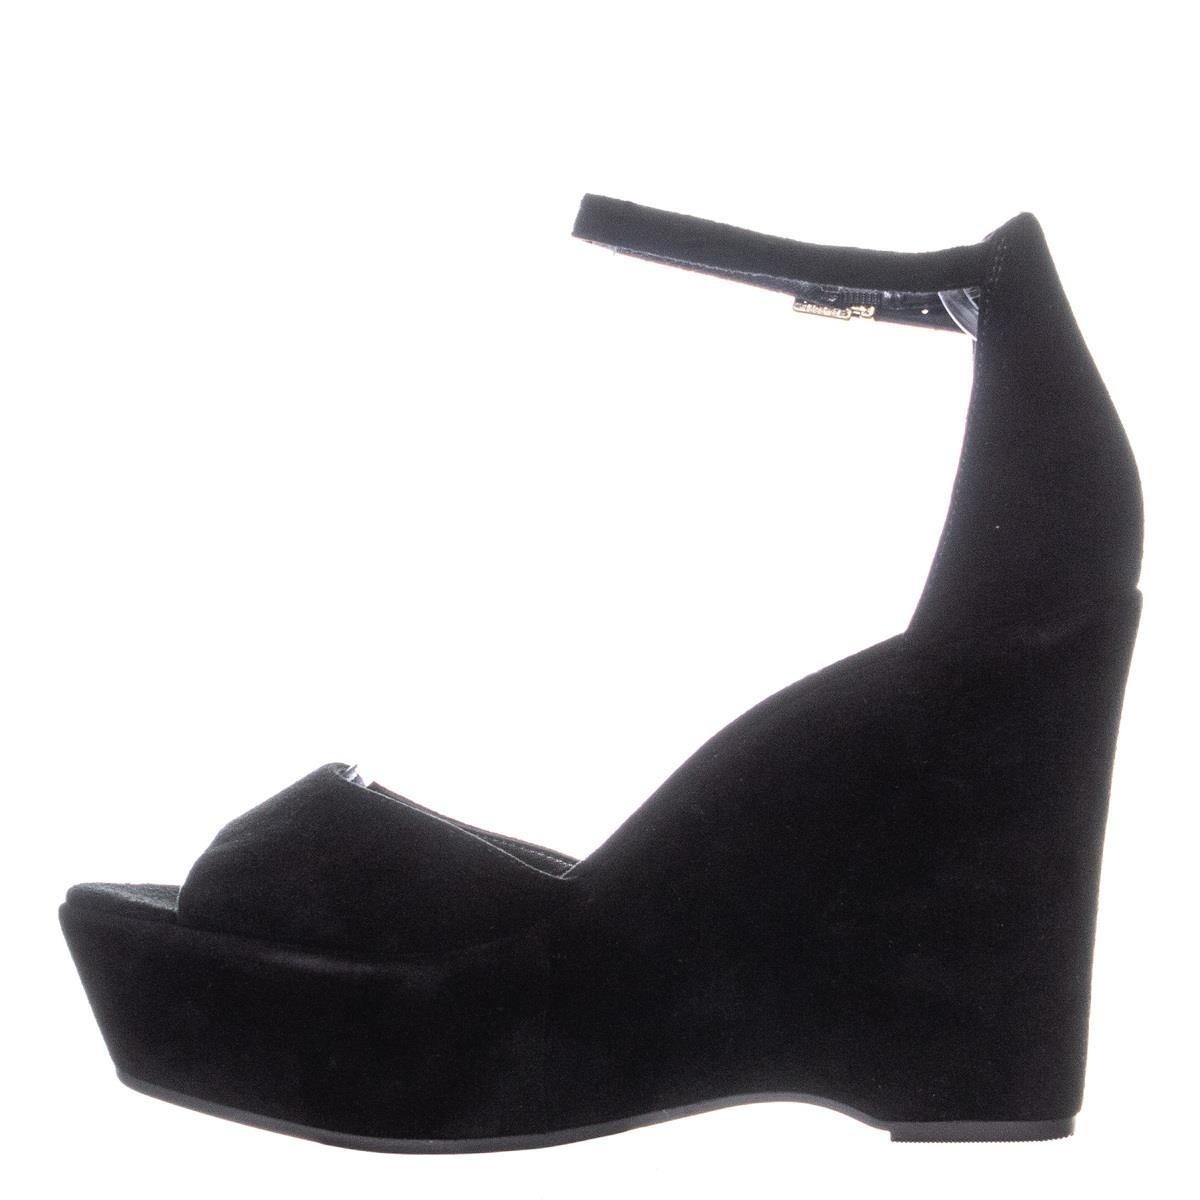 0622ecf184ca Shop Vince Camuto Tatchen Ankle Strap Wedge Sandals